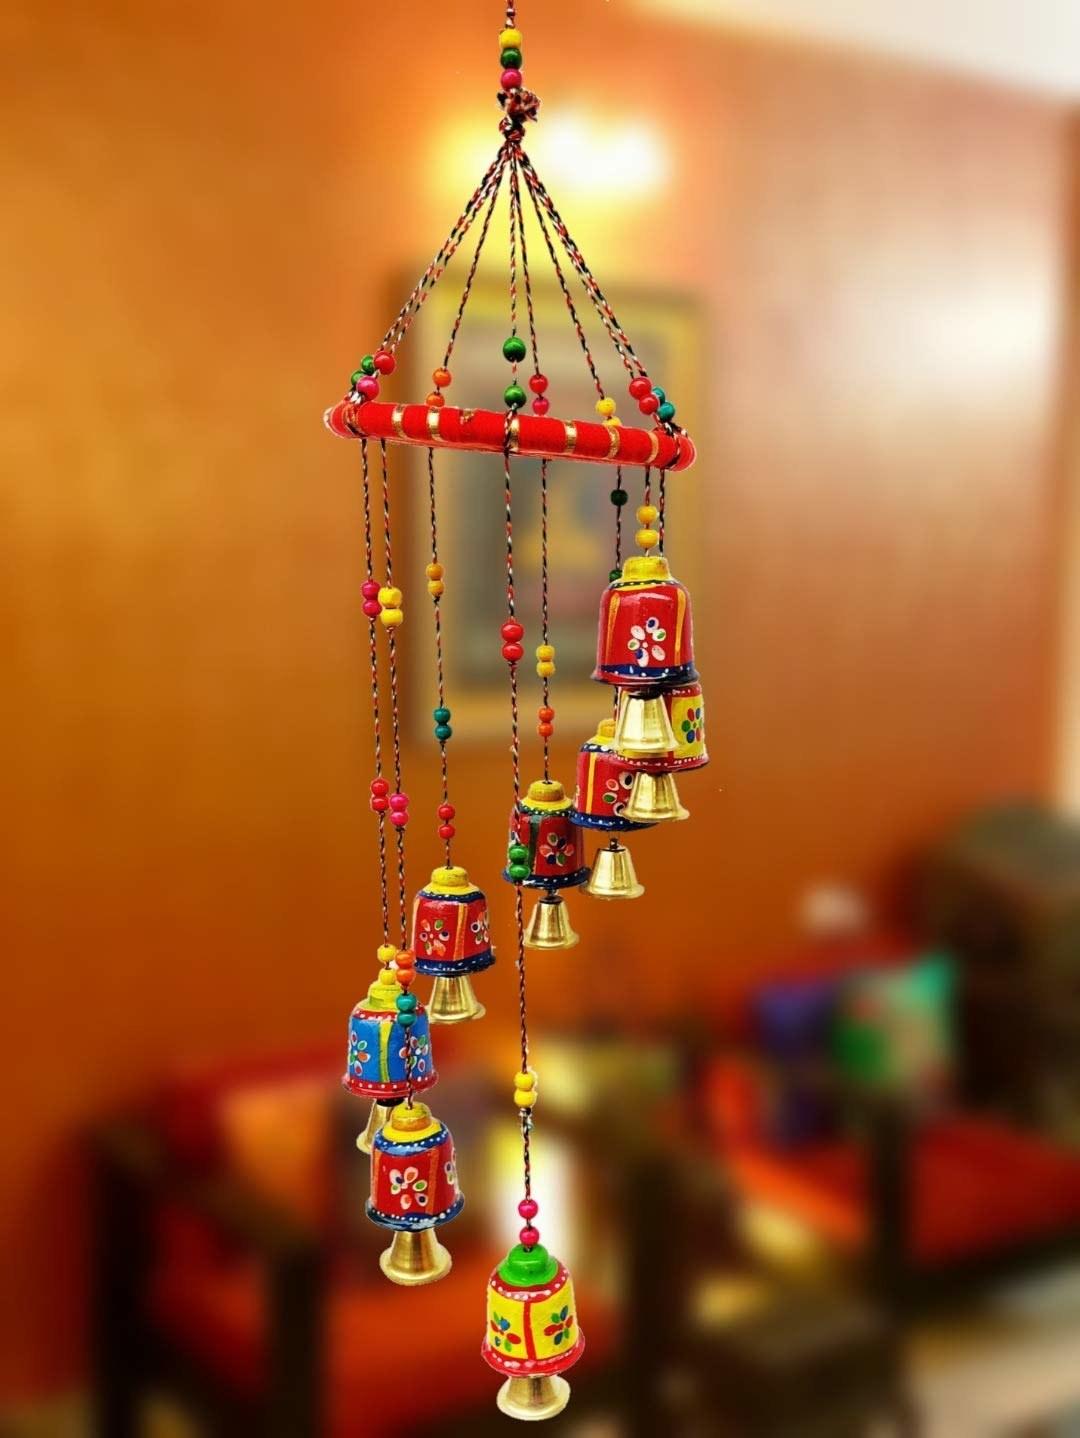 A set of colourful bells